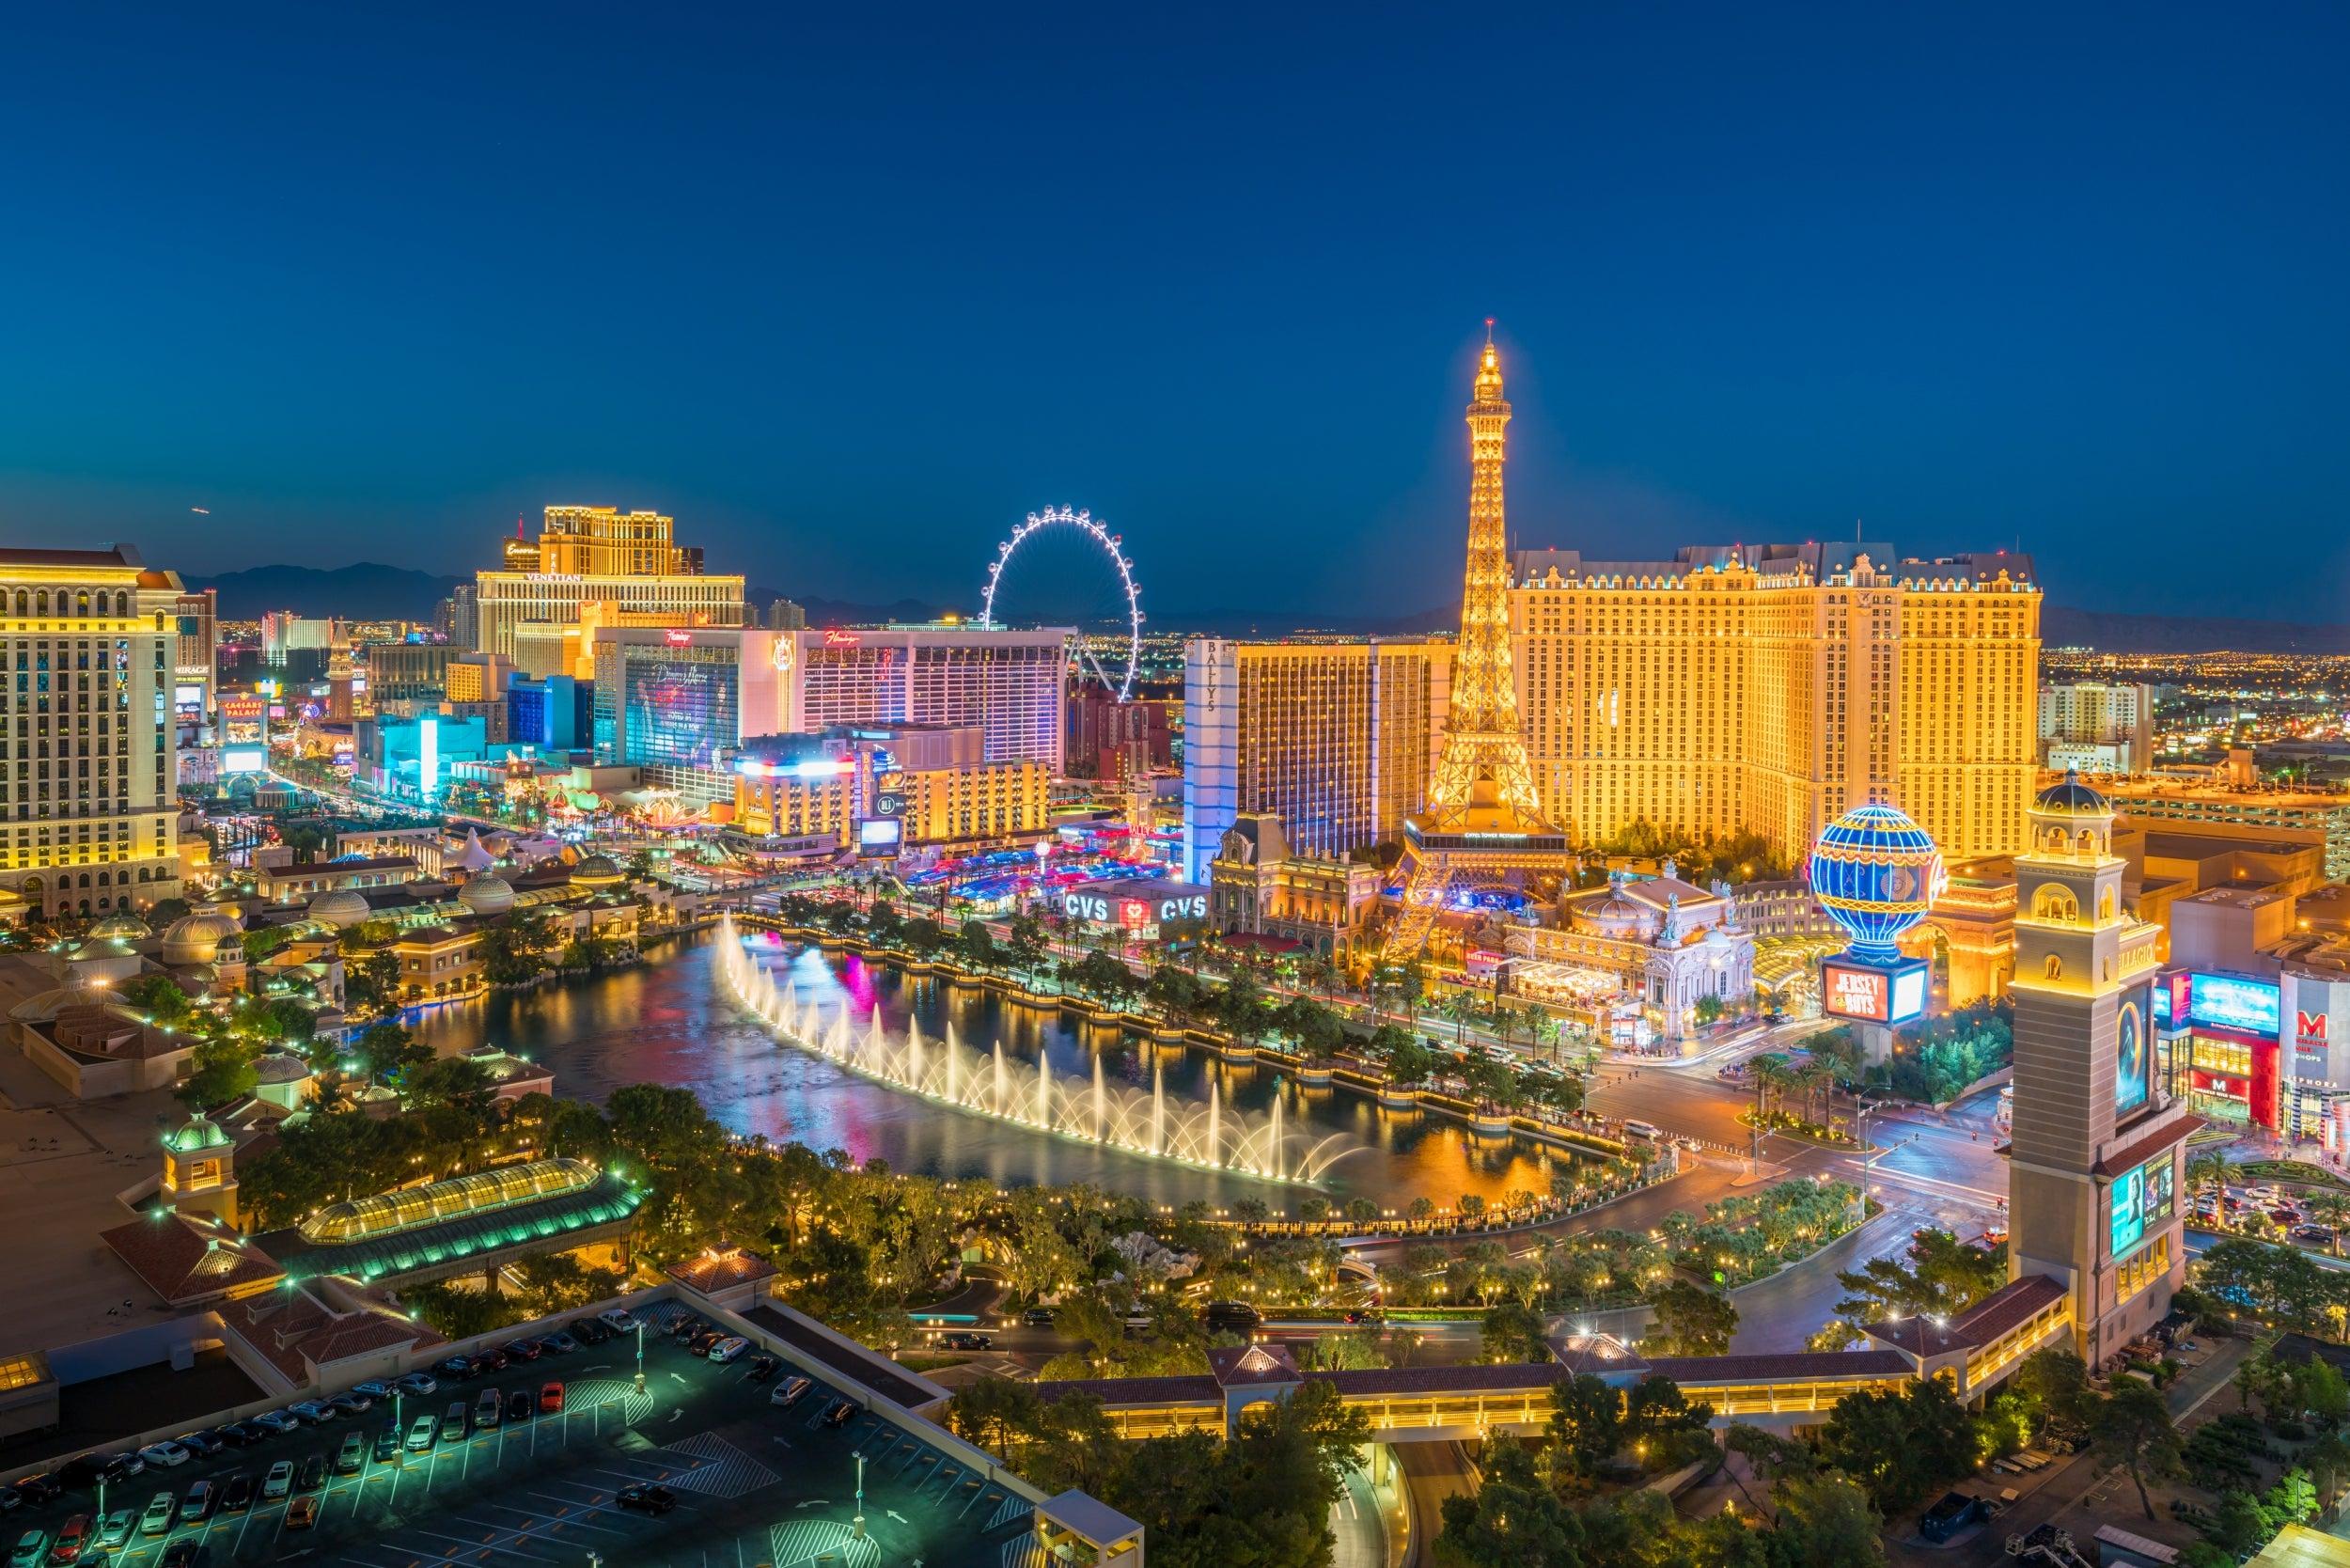 Las Vegas: Sin City bets big on culture